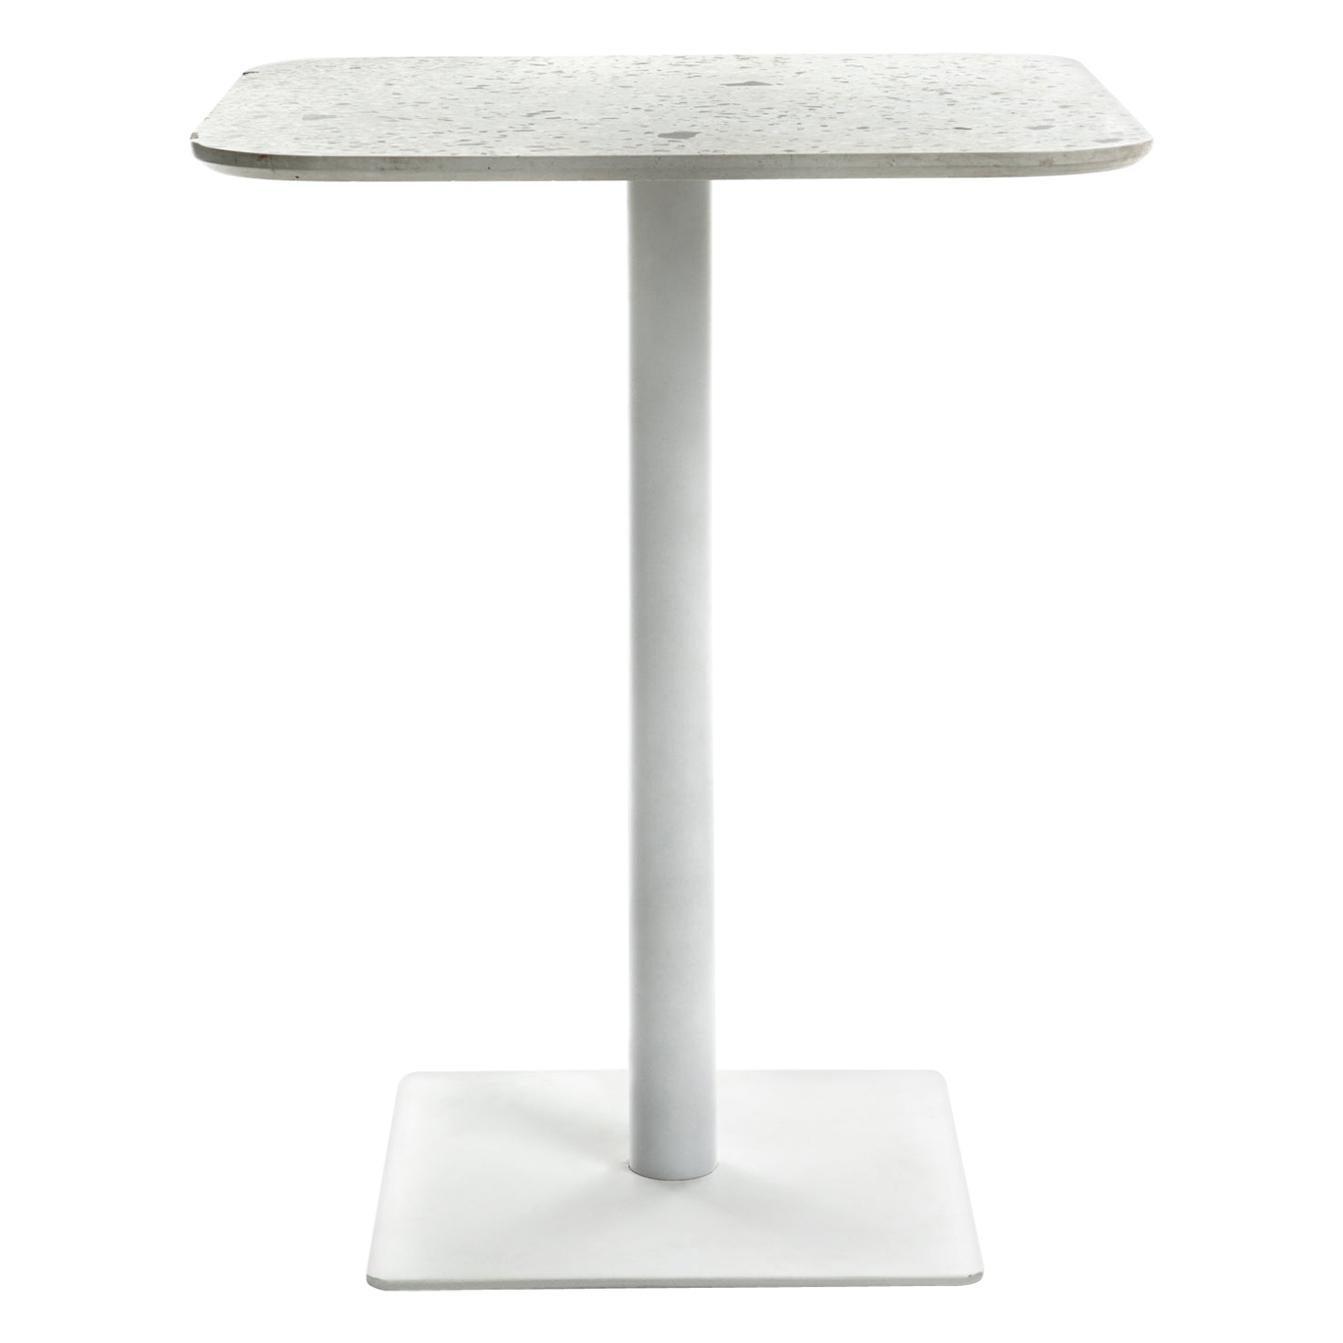 Square Dining Table 'I' in White Terrazzo